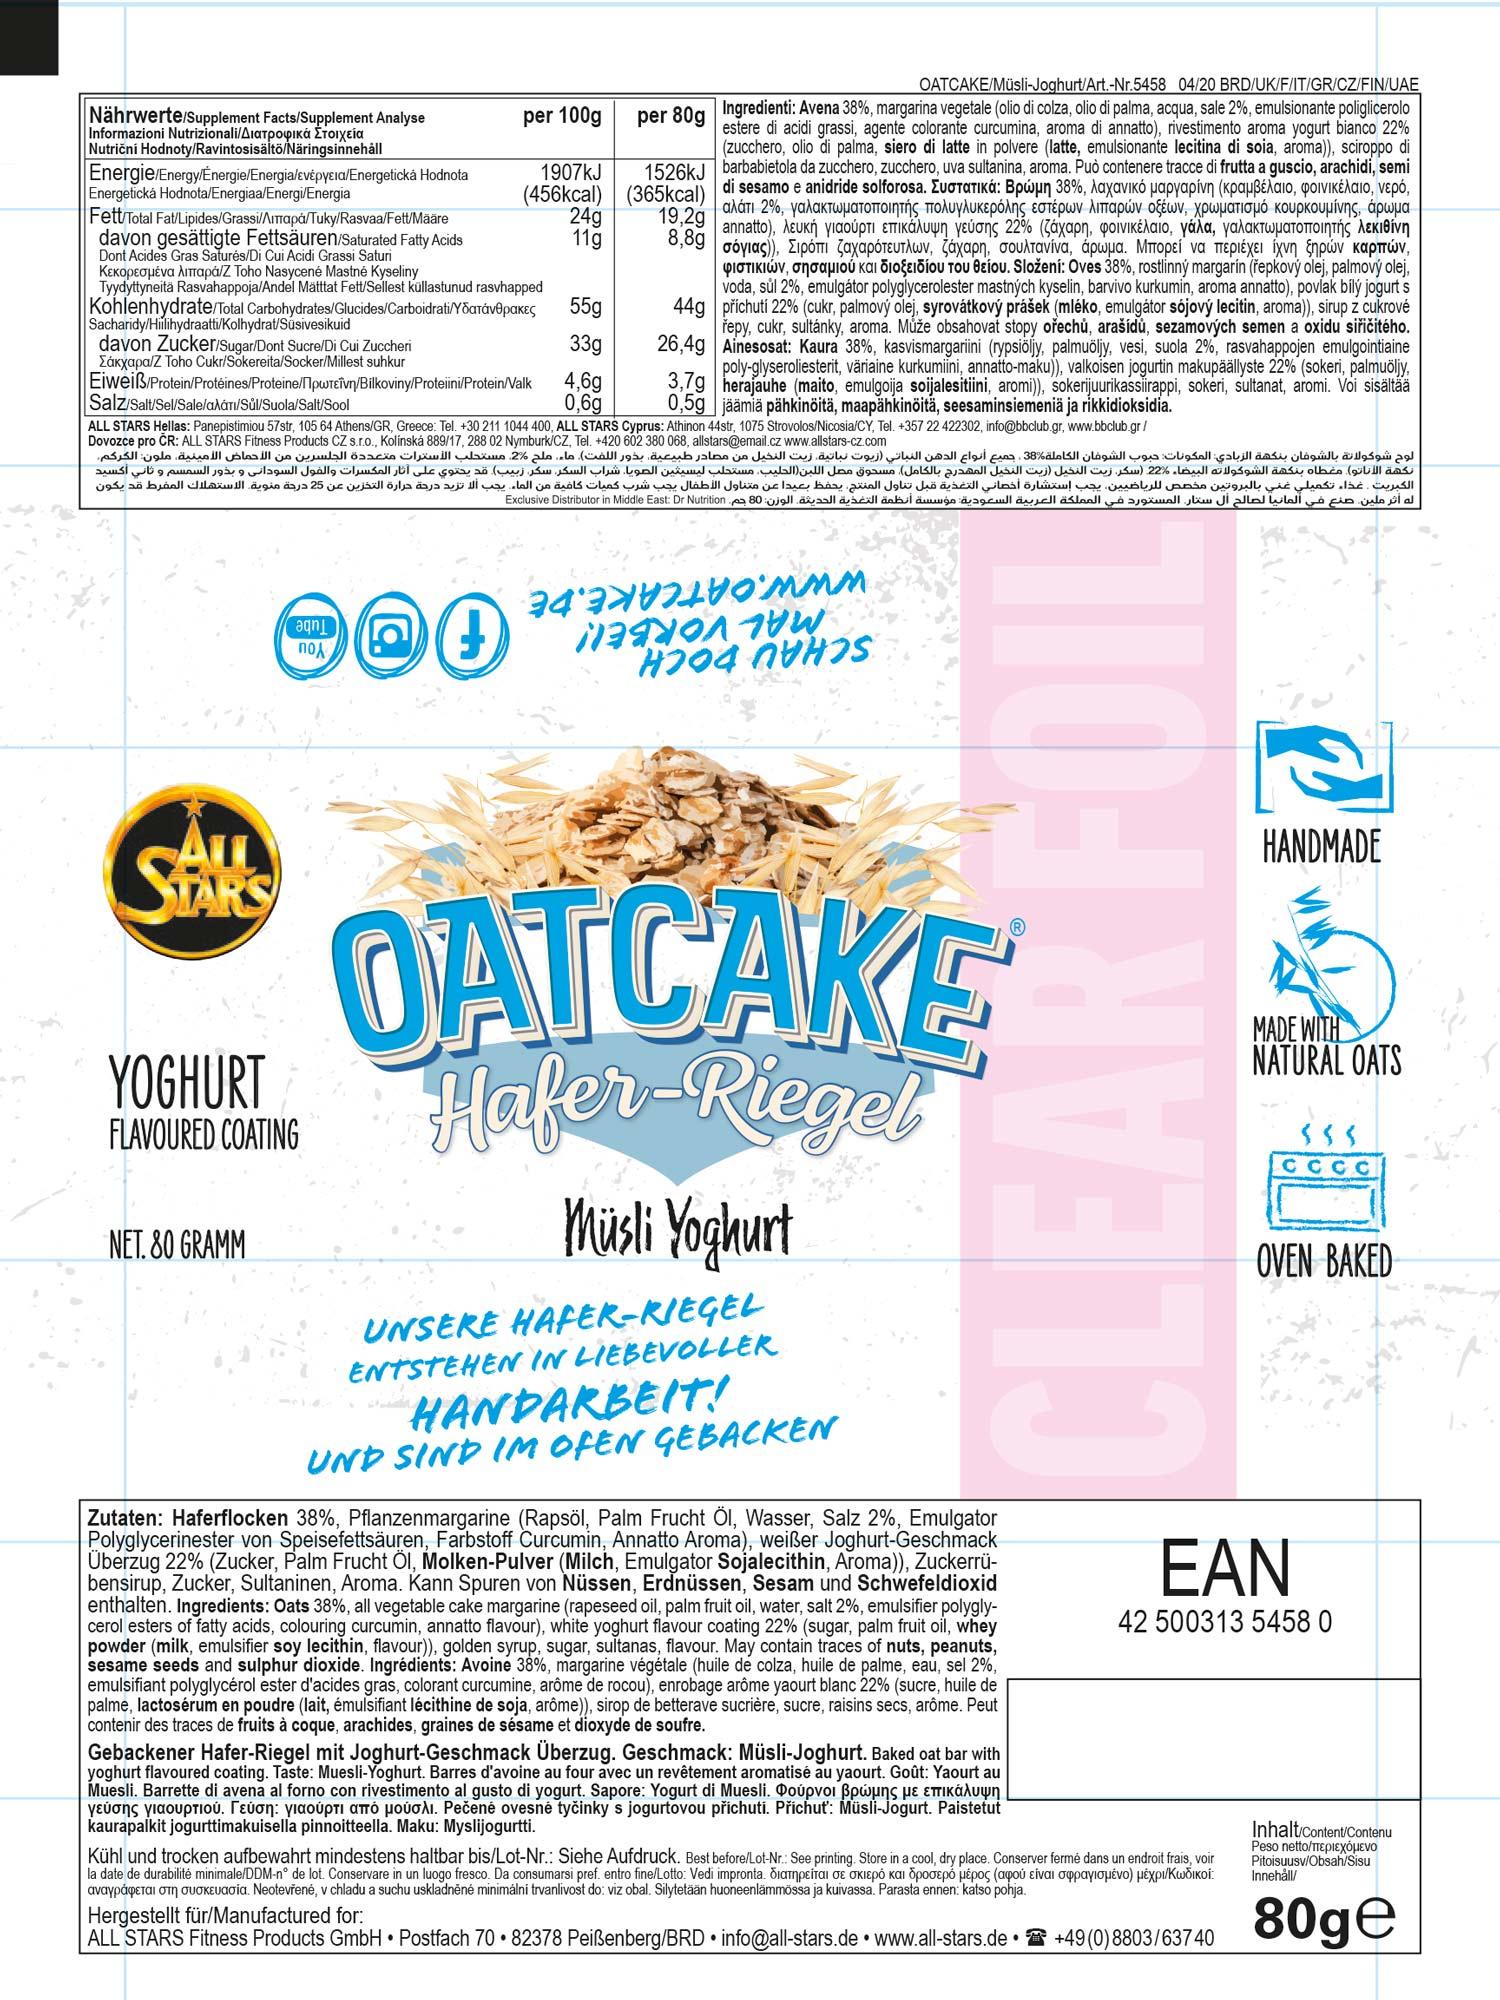 OATCAKE_Musli-Yoghurt